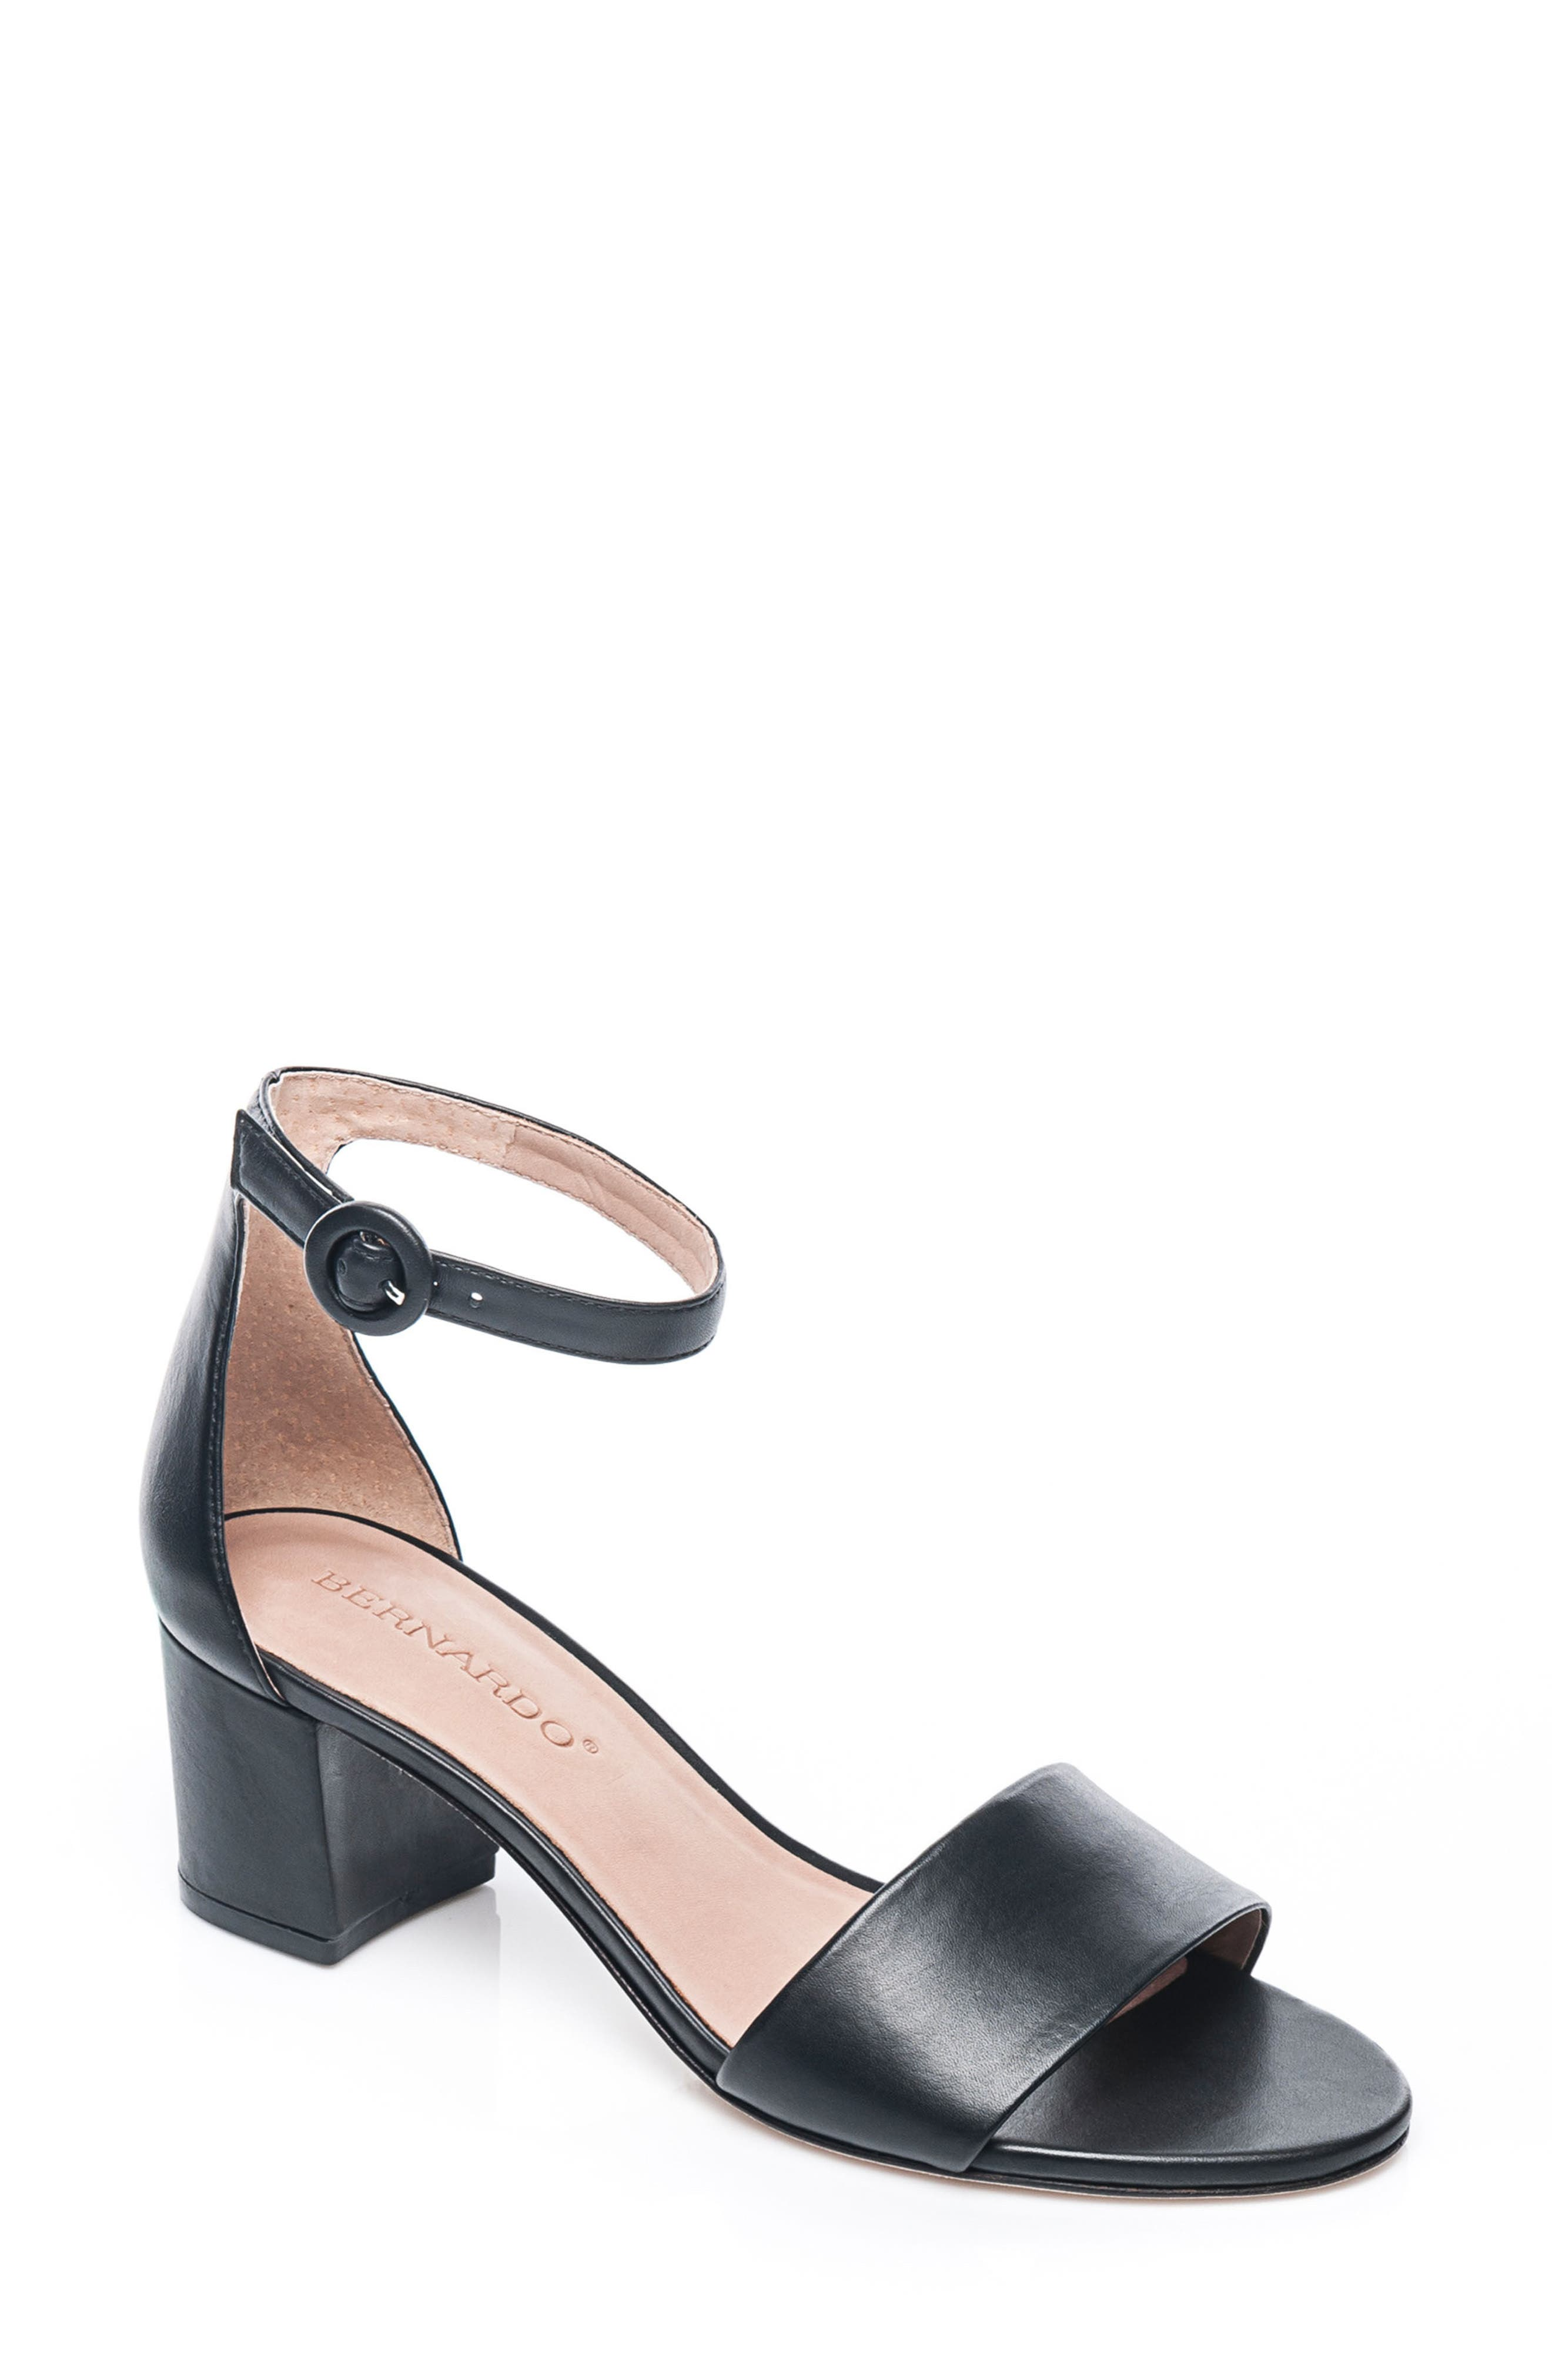 Bernardo Belinda Ankle Strap Sandal,                             Main thumbnail 1, color,                             Black Leather